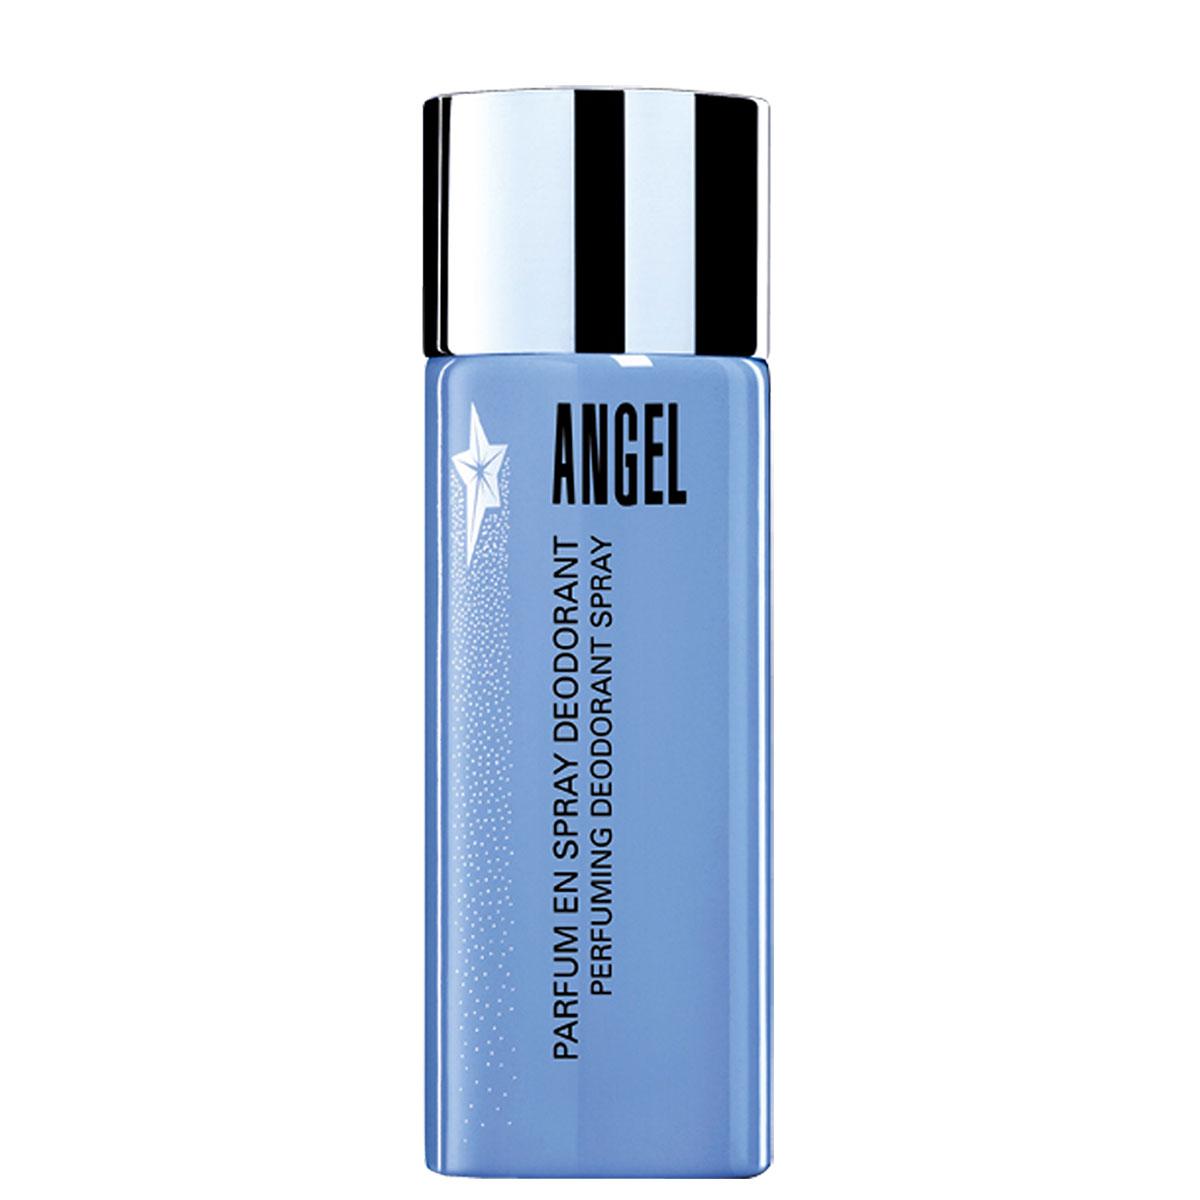 Déodorant Spray Angel - MUGLER